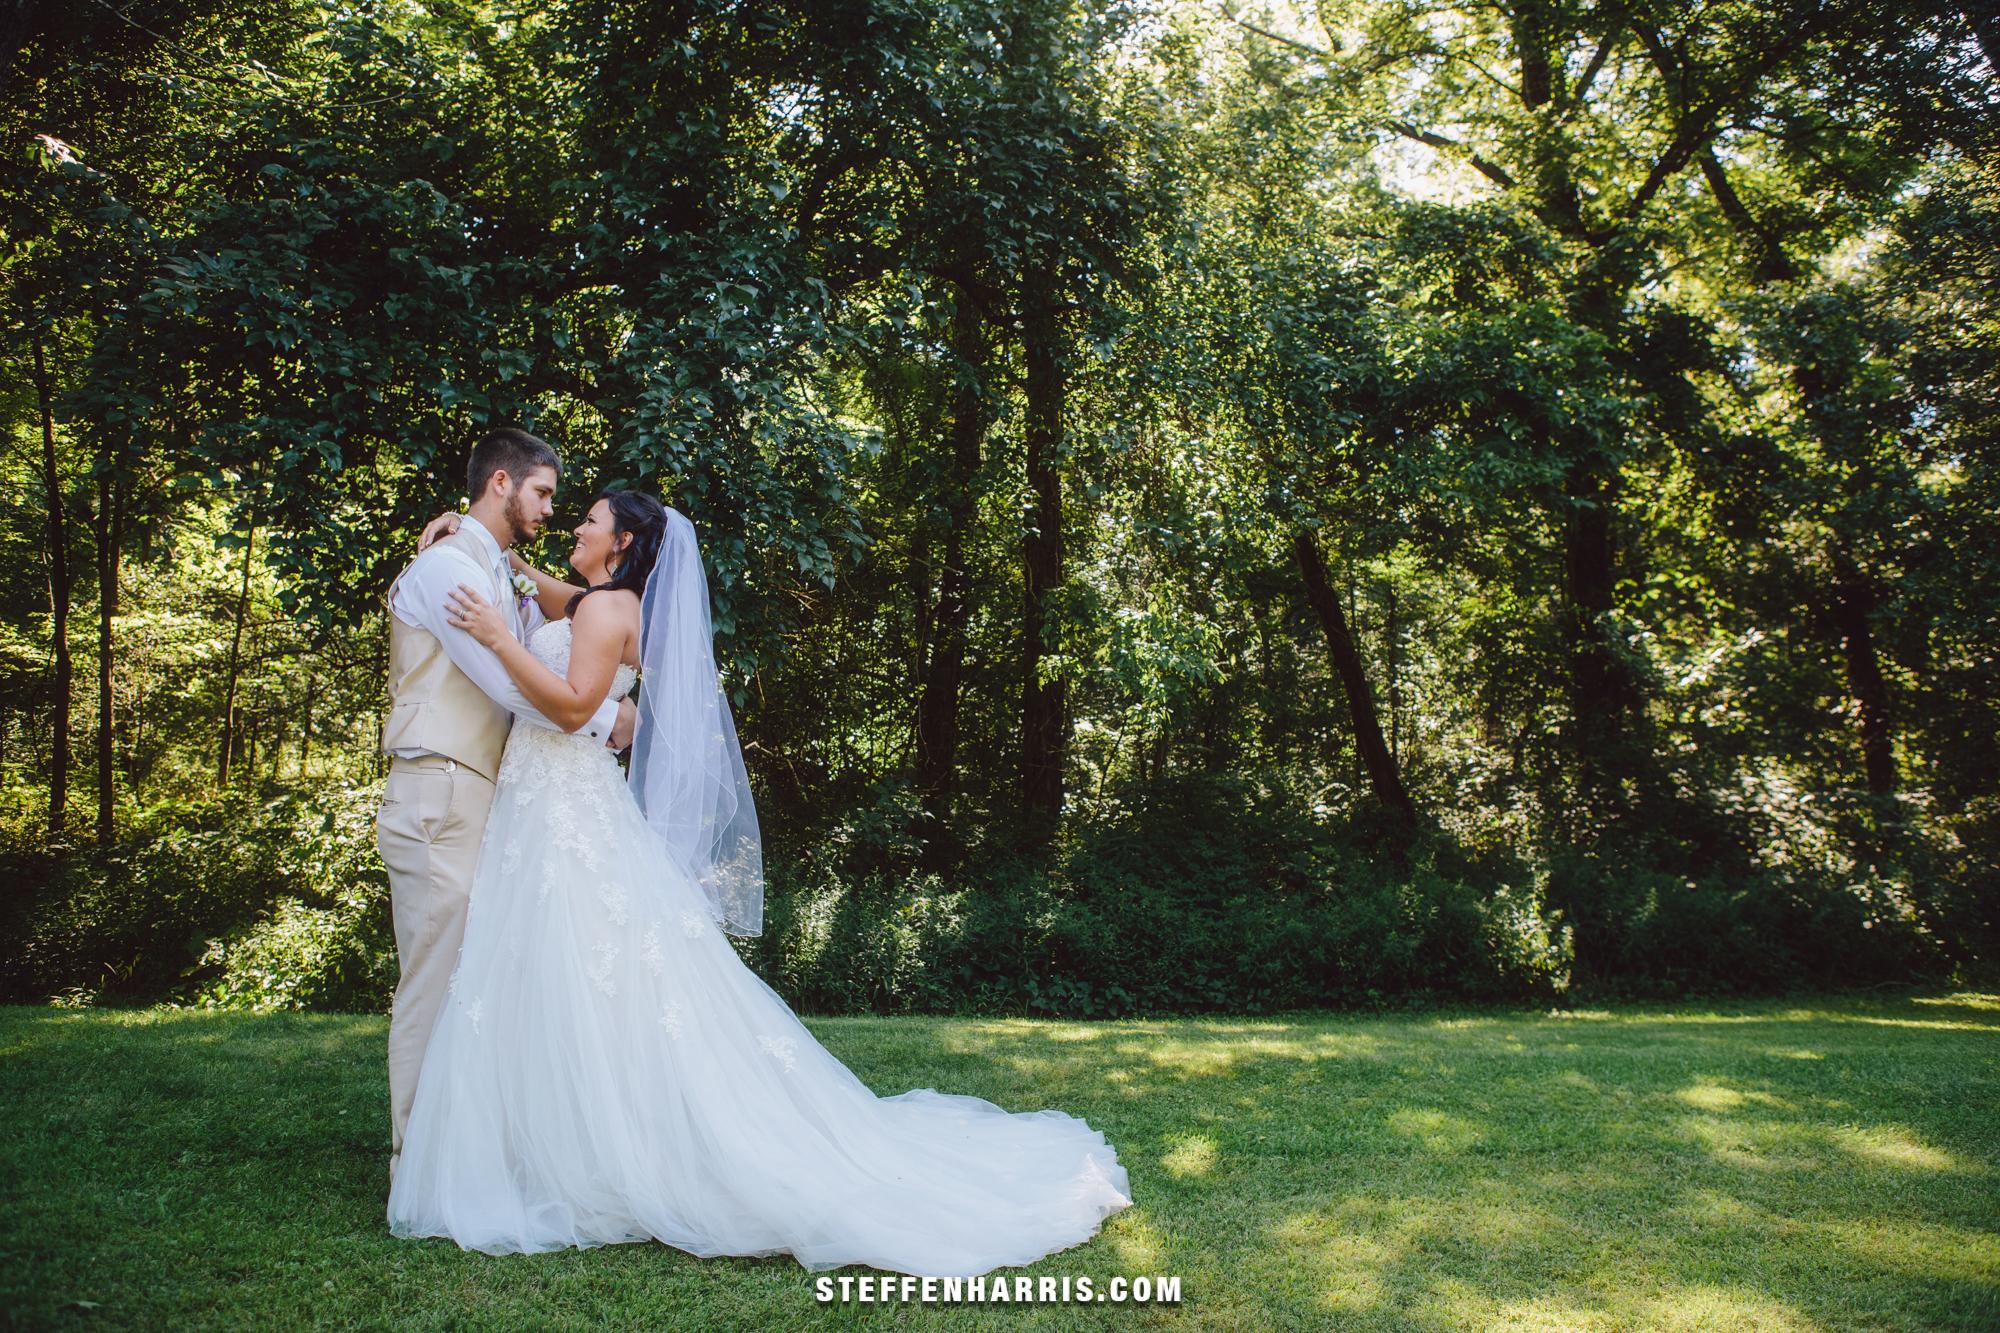 casey-aaron-salem-il-wedding-photography-49